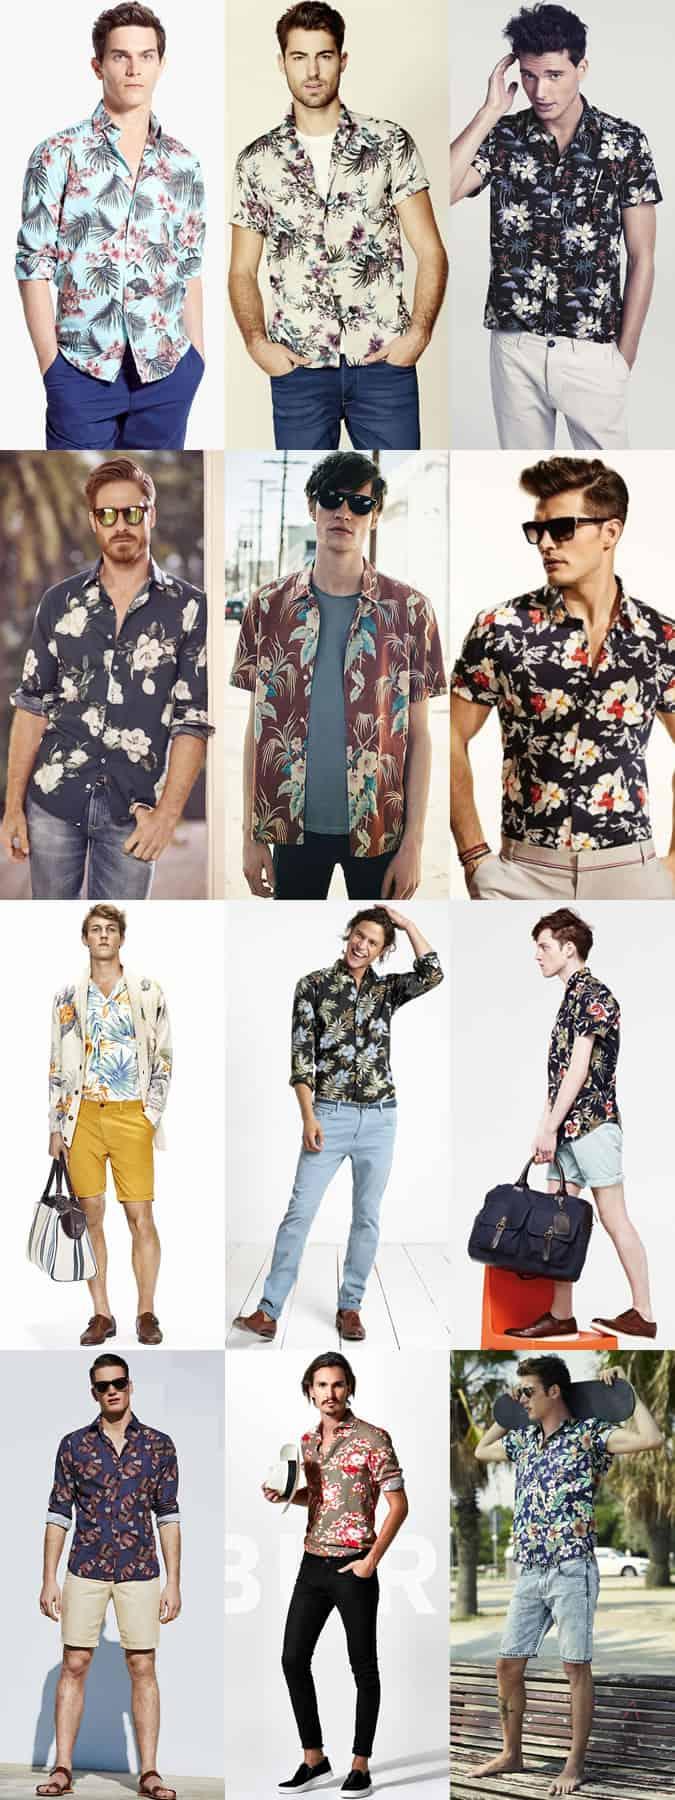 fine modern hawaiian outfit for men 8